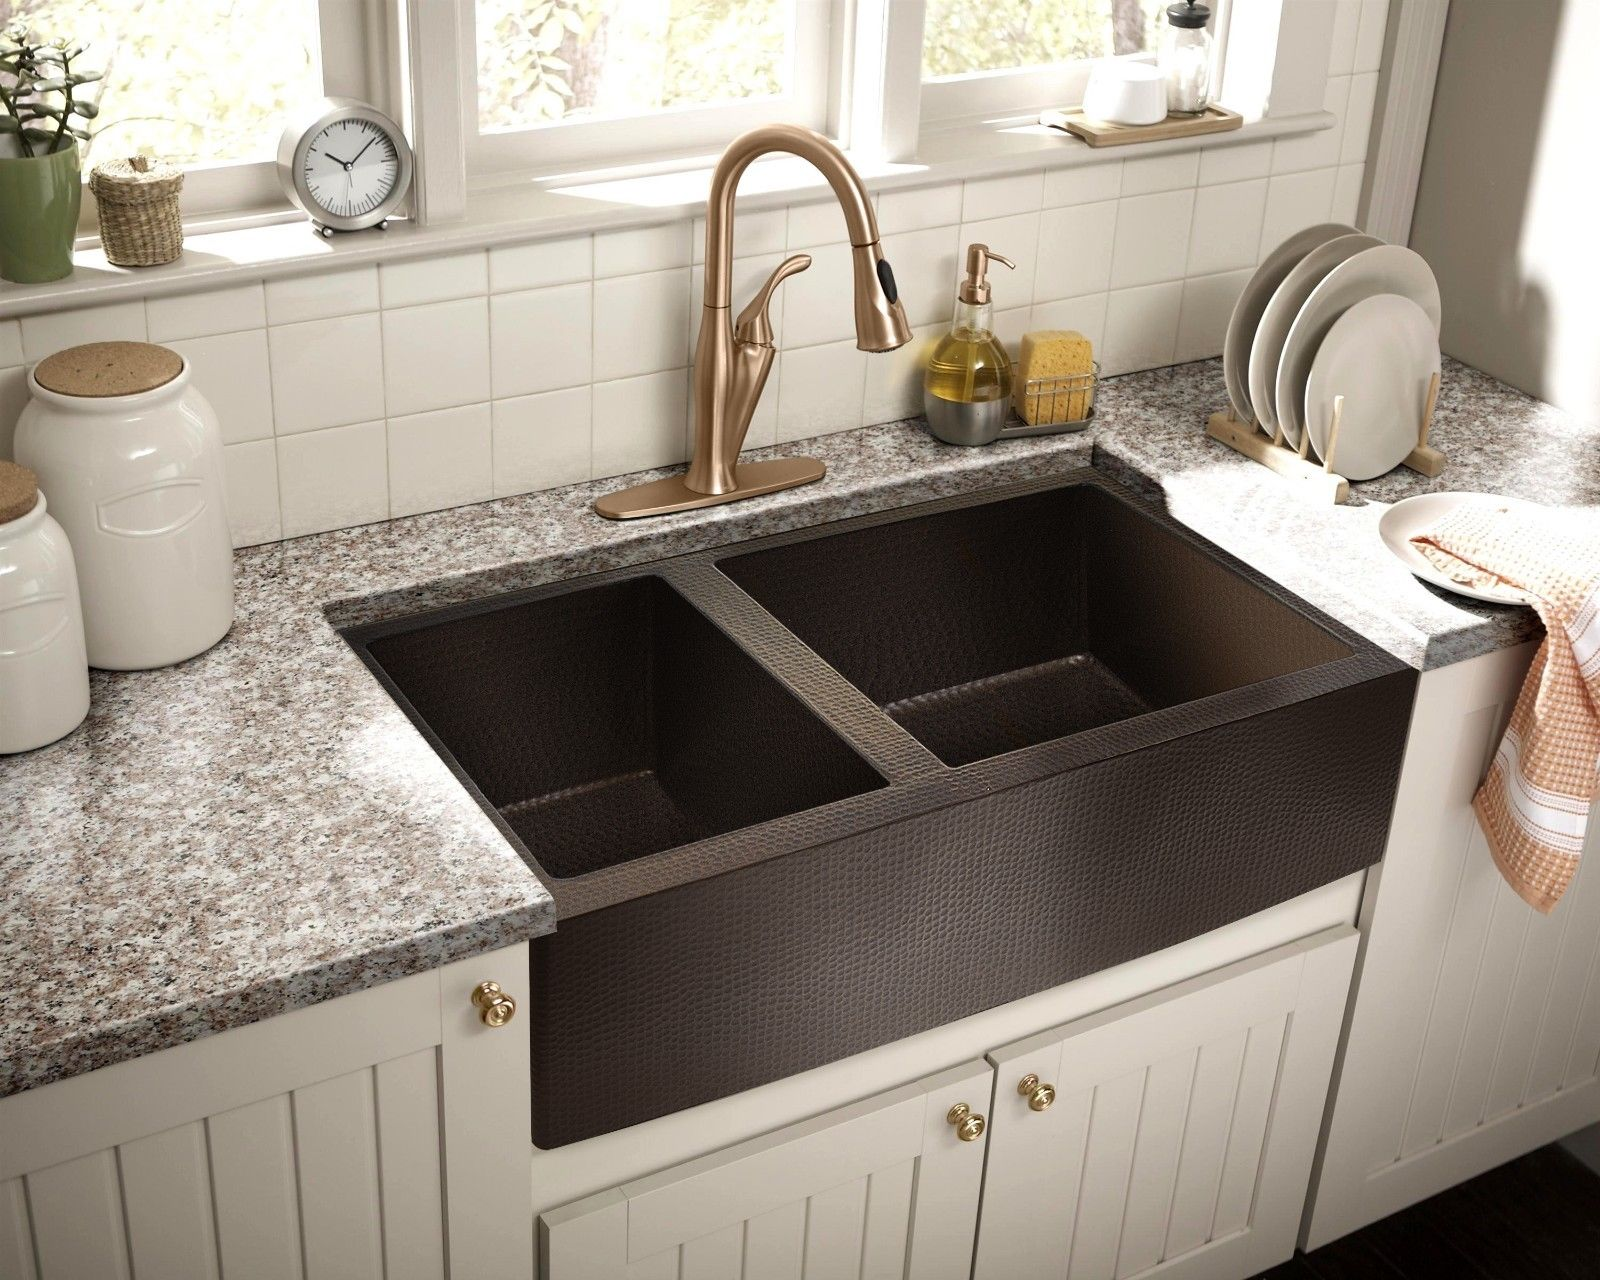 Hammered Copper Apron Farmhouse Kitchen Sink 33 X22 60 40 No Custom Duties 813584013676 Ebay